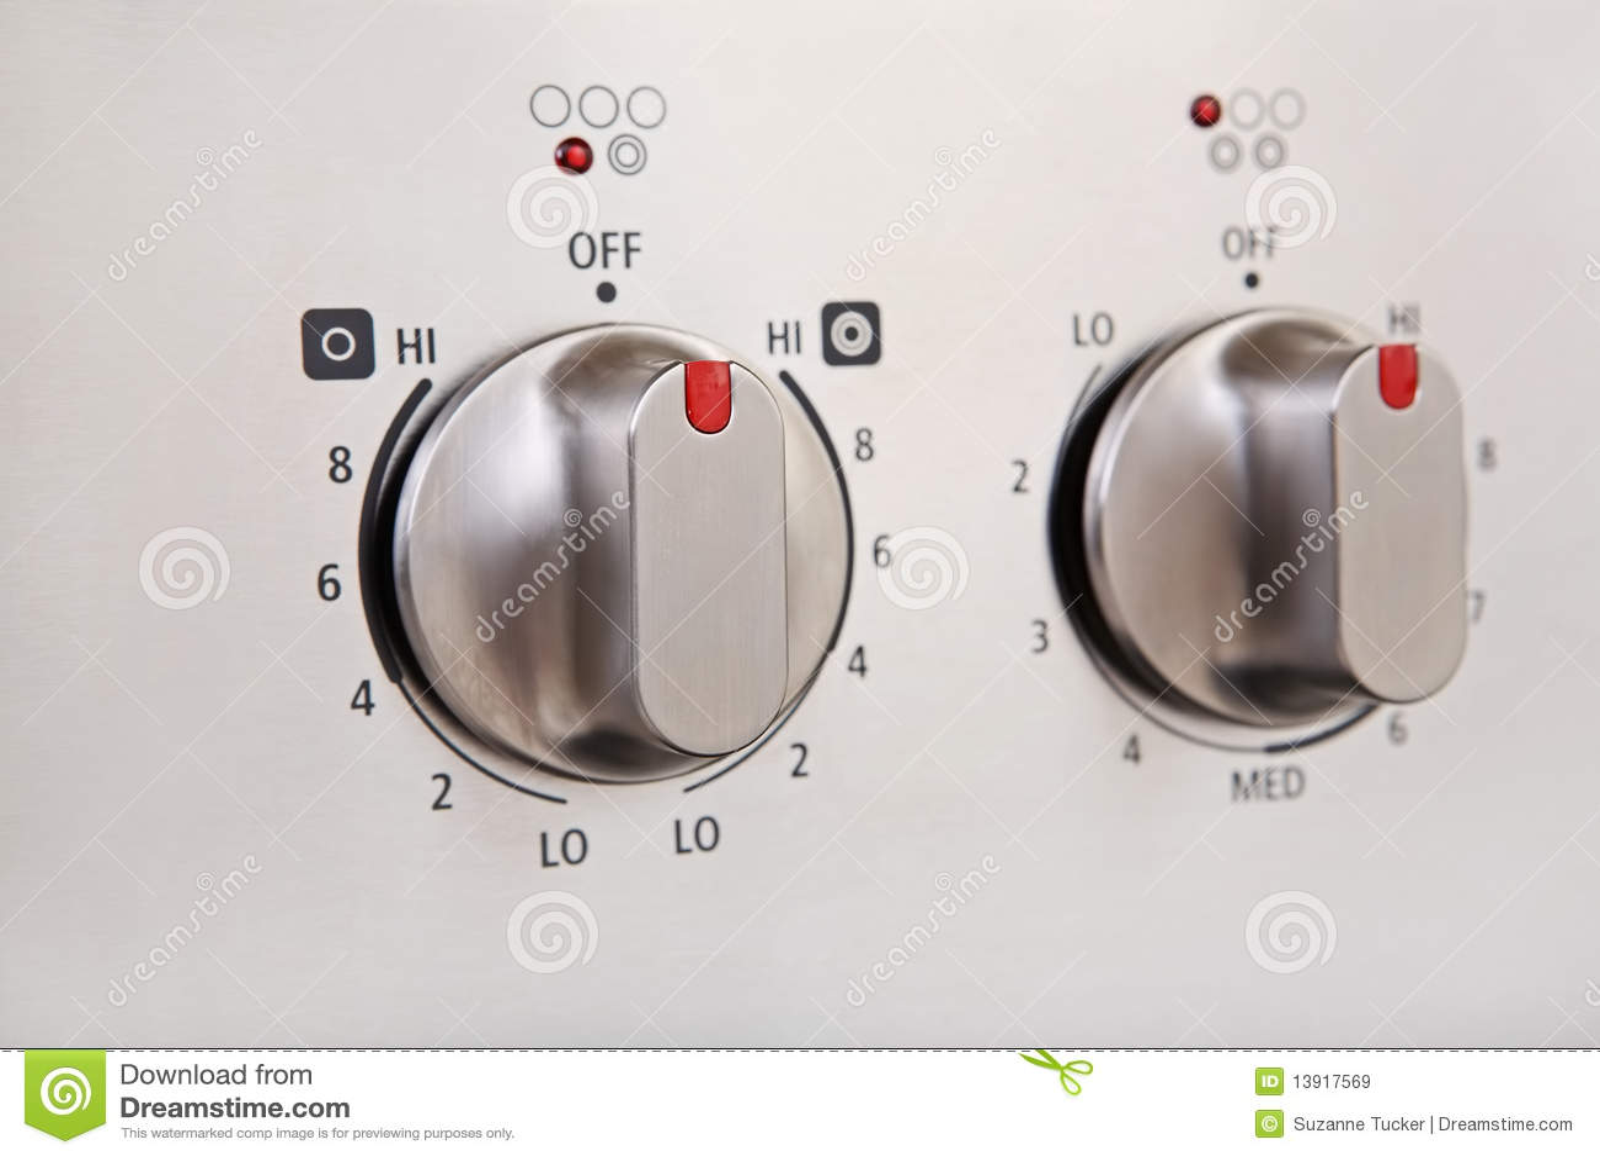 stove knobs. close kitchen knobs modern stainless stove 3